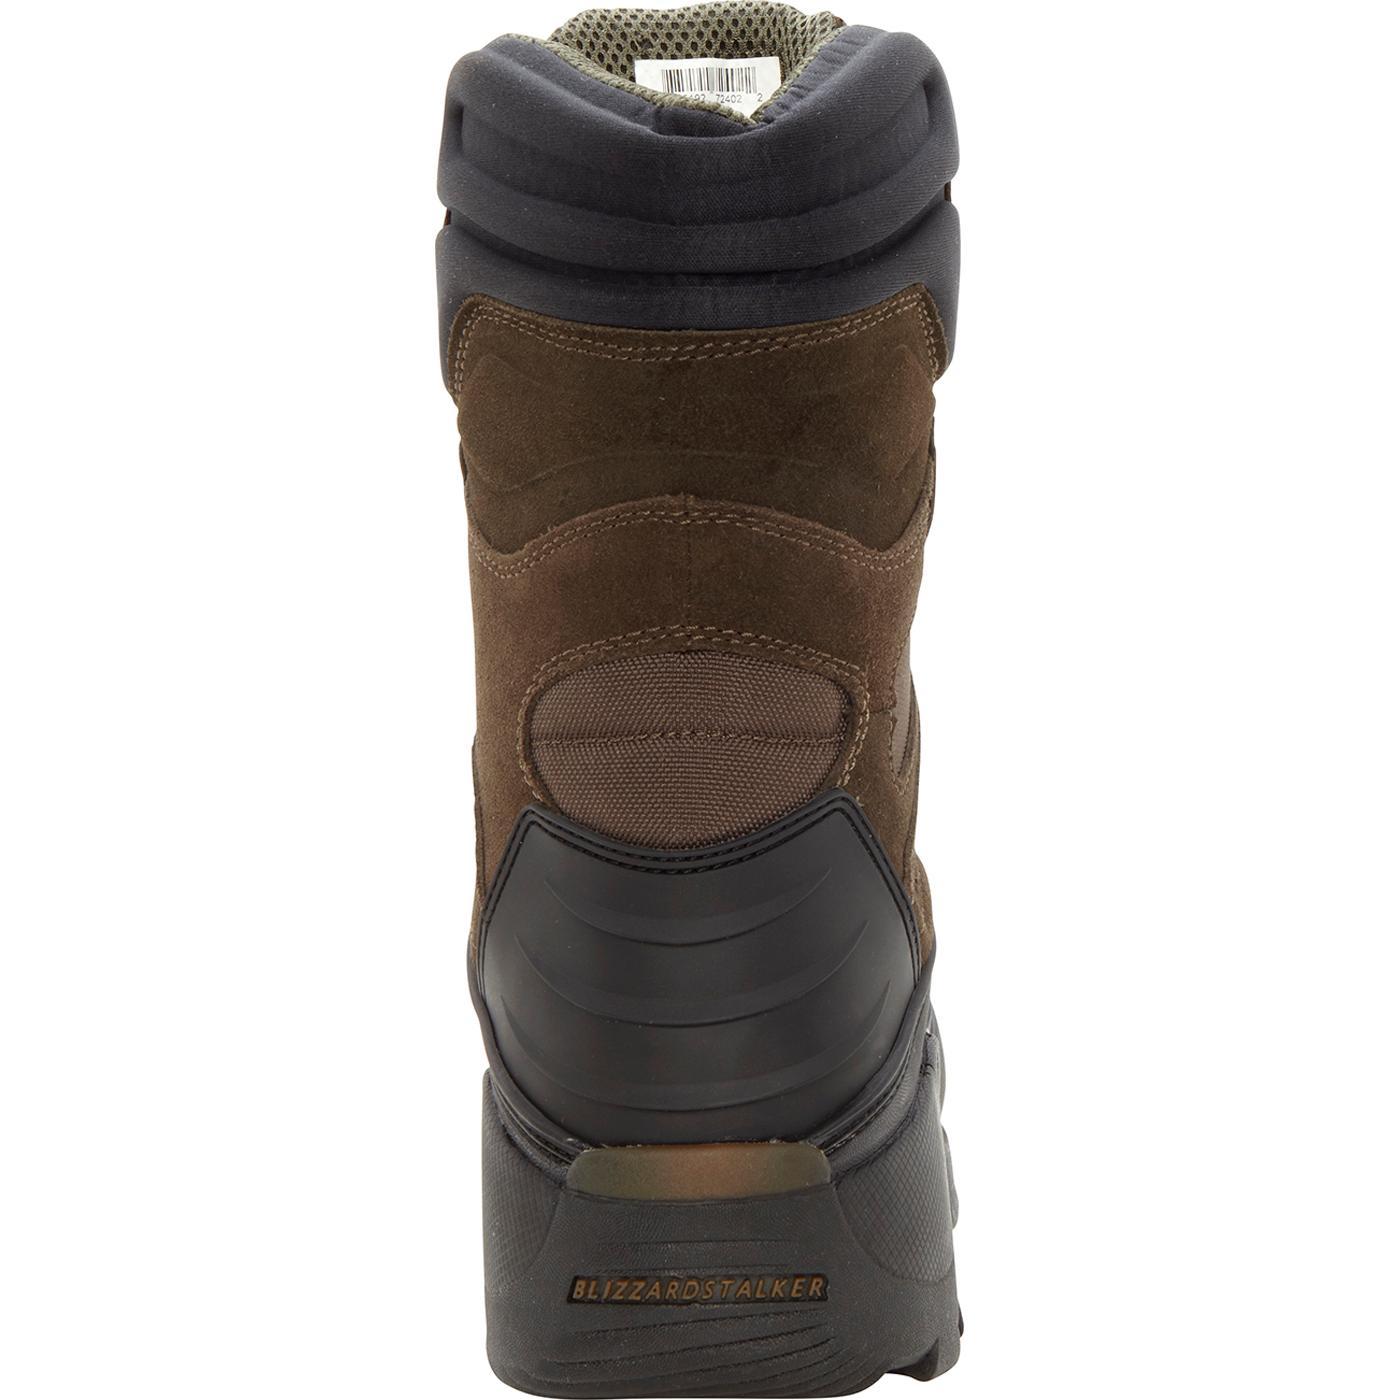 Men's Steel Toe Waterproof Insulated Work Boot - The Rocky Boot ...